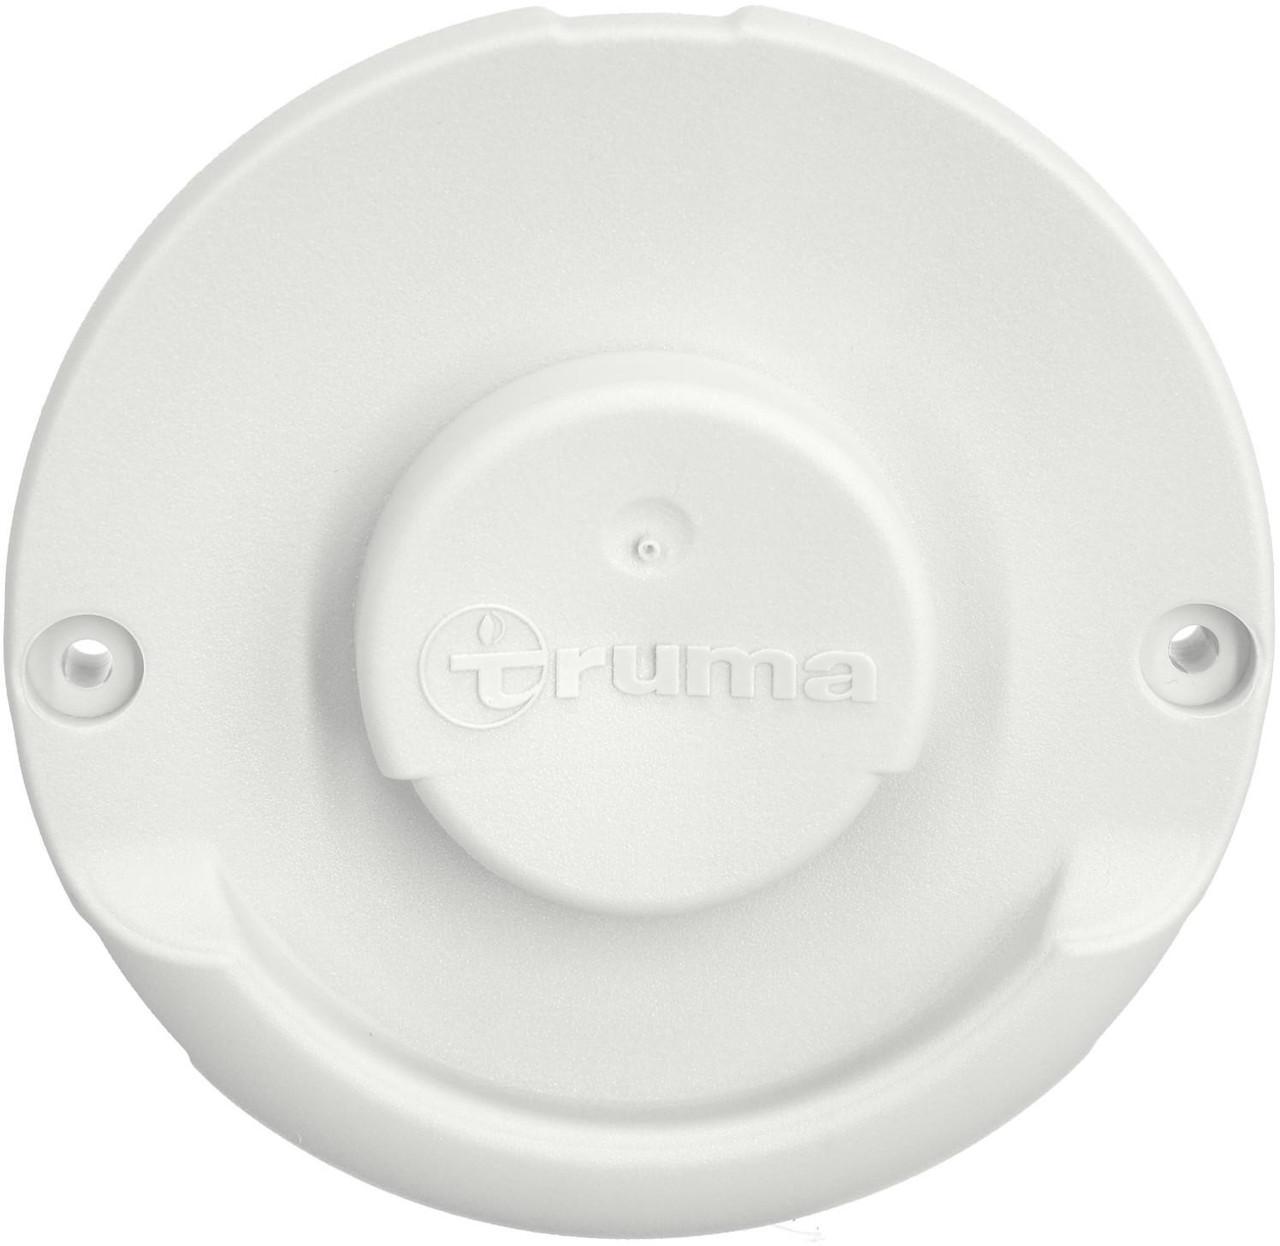 Truma white cover plate for exterior exhaust cowl